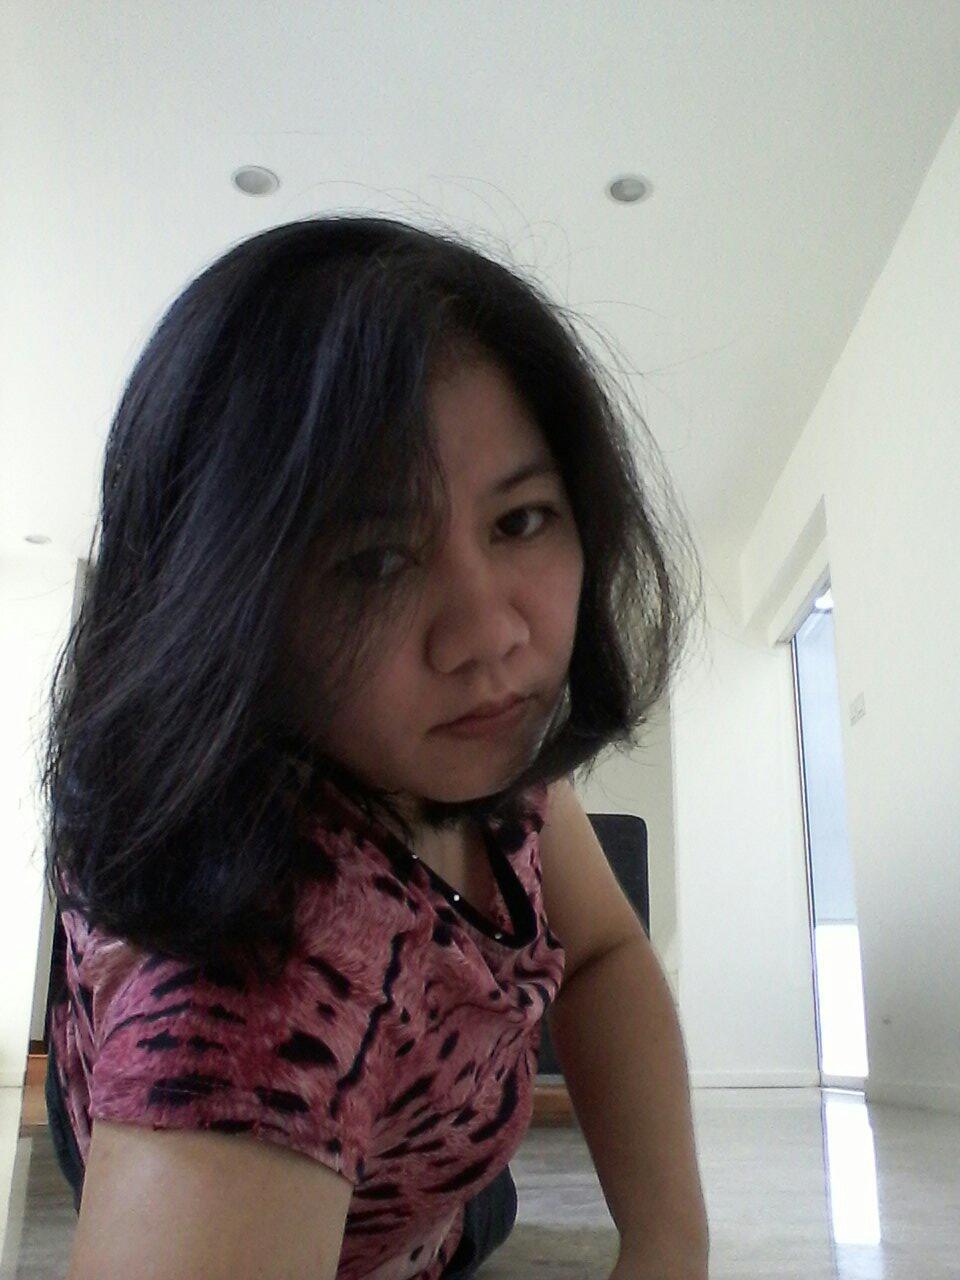 Hi http://t.co/21t7jUgnSL